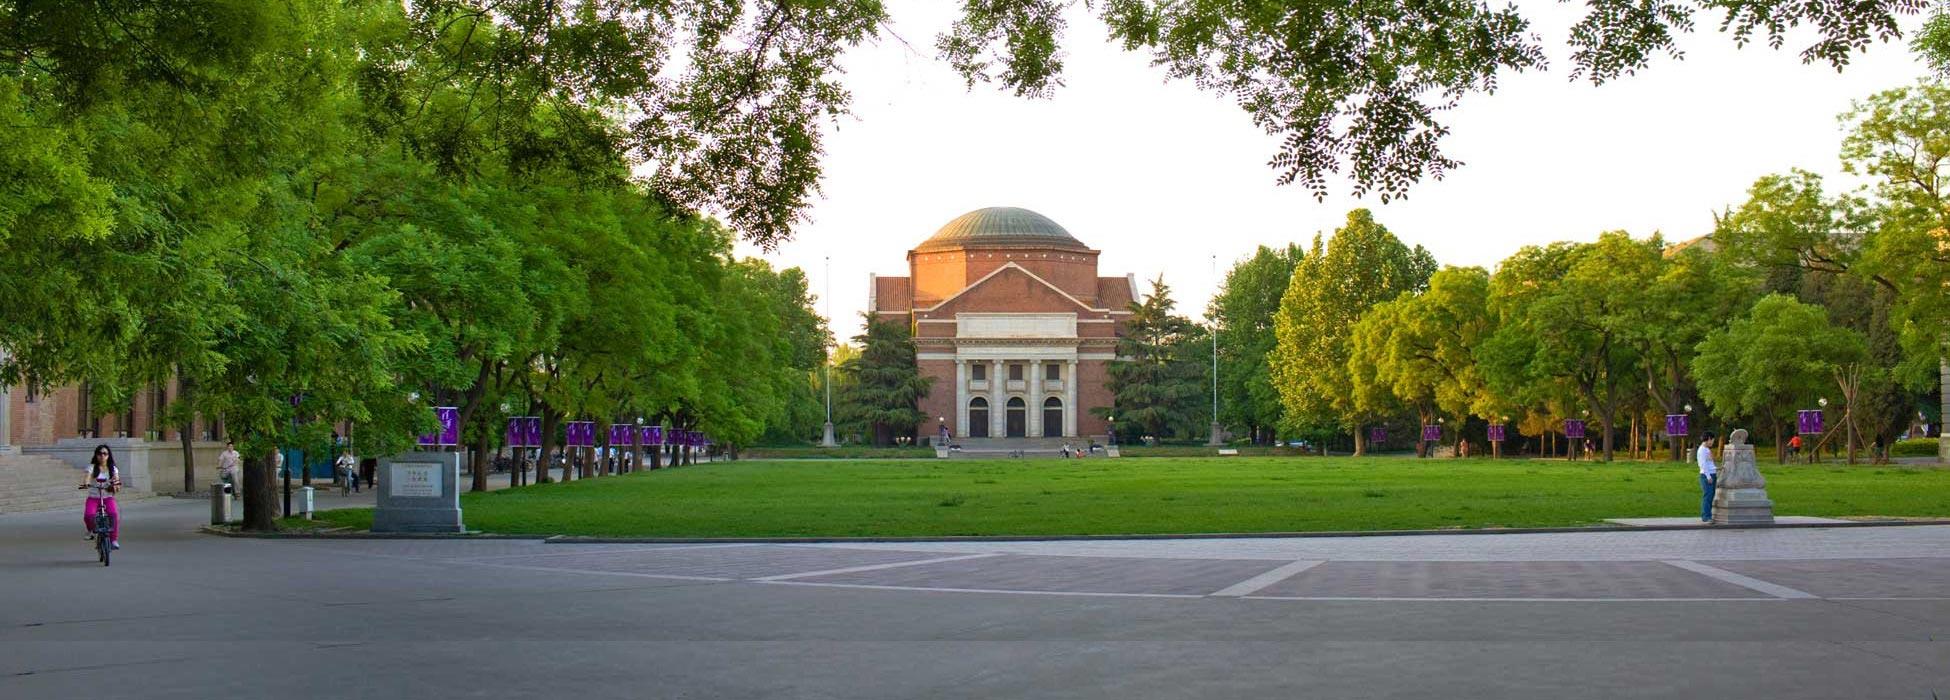 As China's Tsinghua University Joins the Big Club of Oxford, Harvard, etc